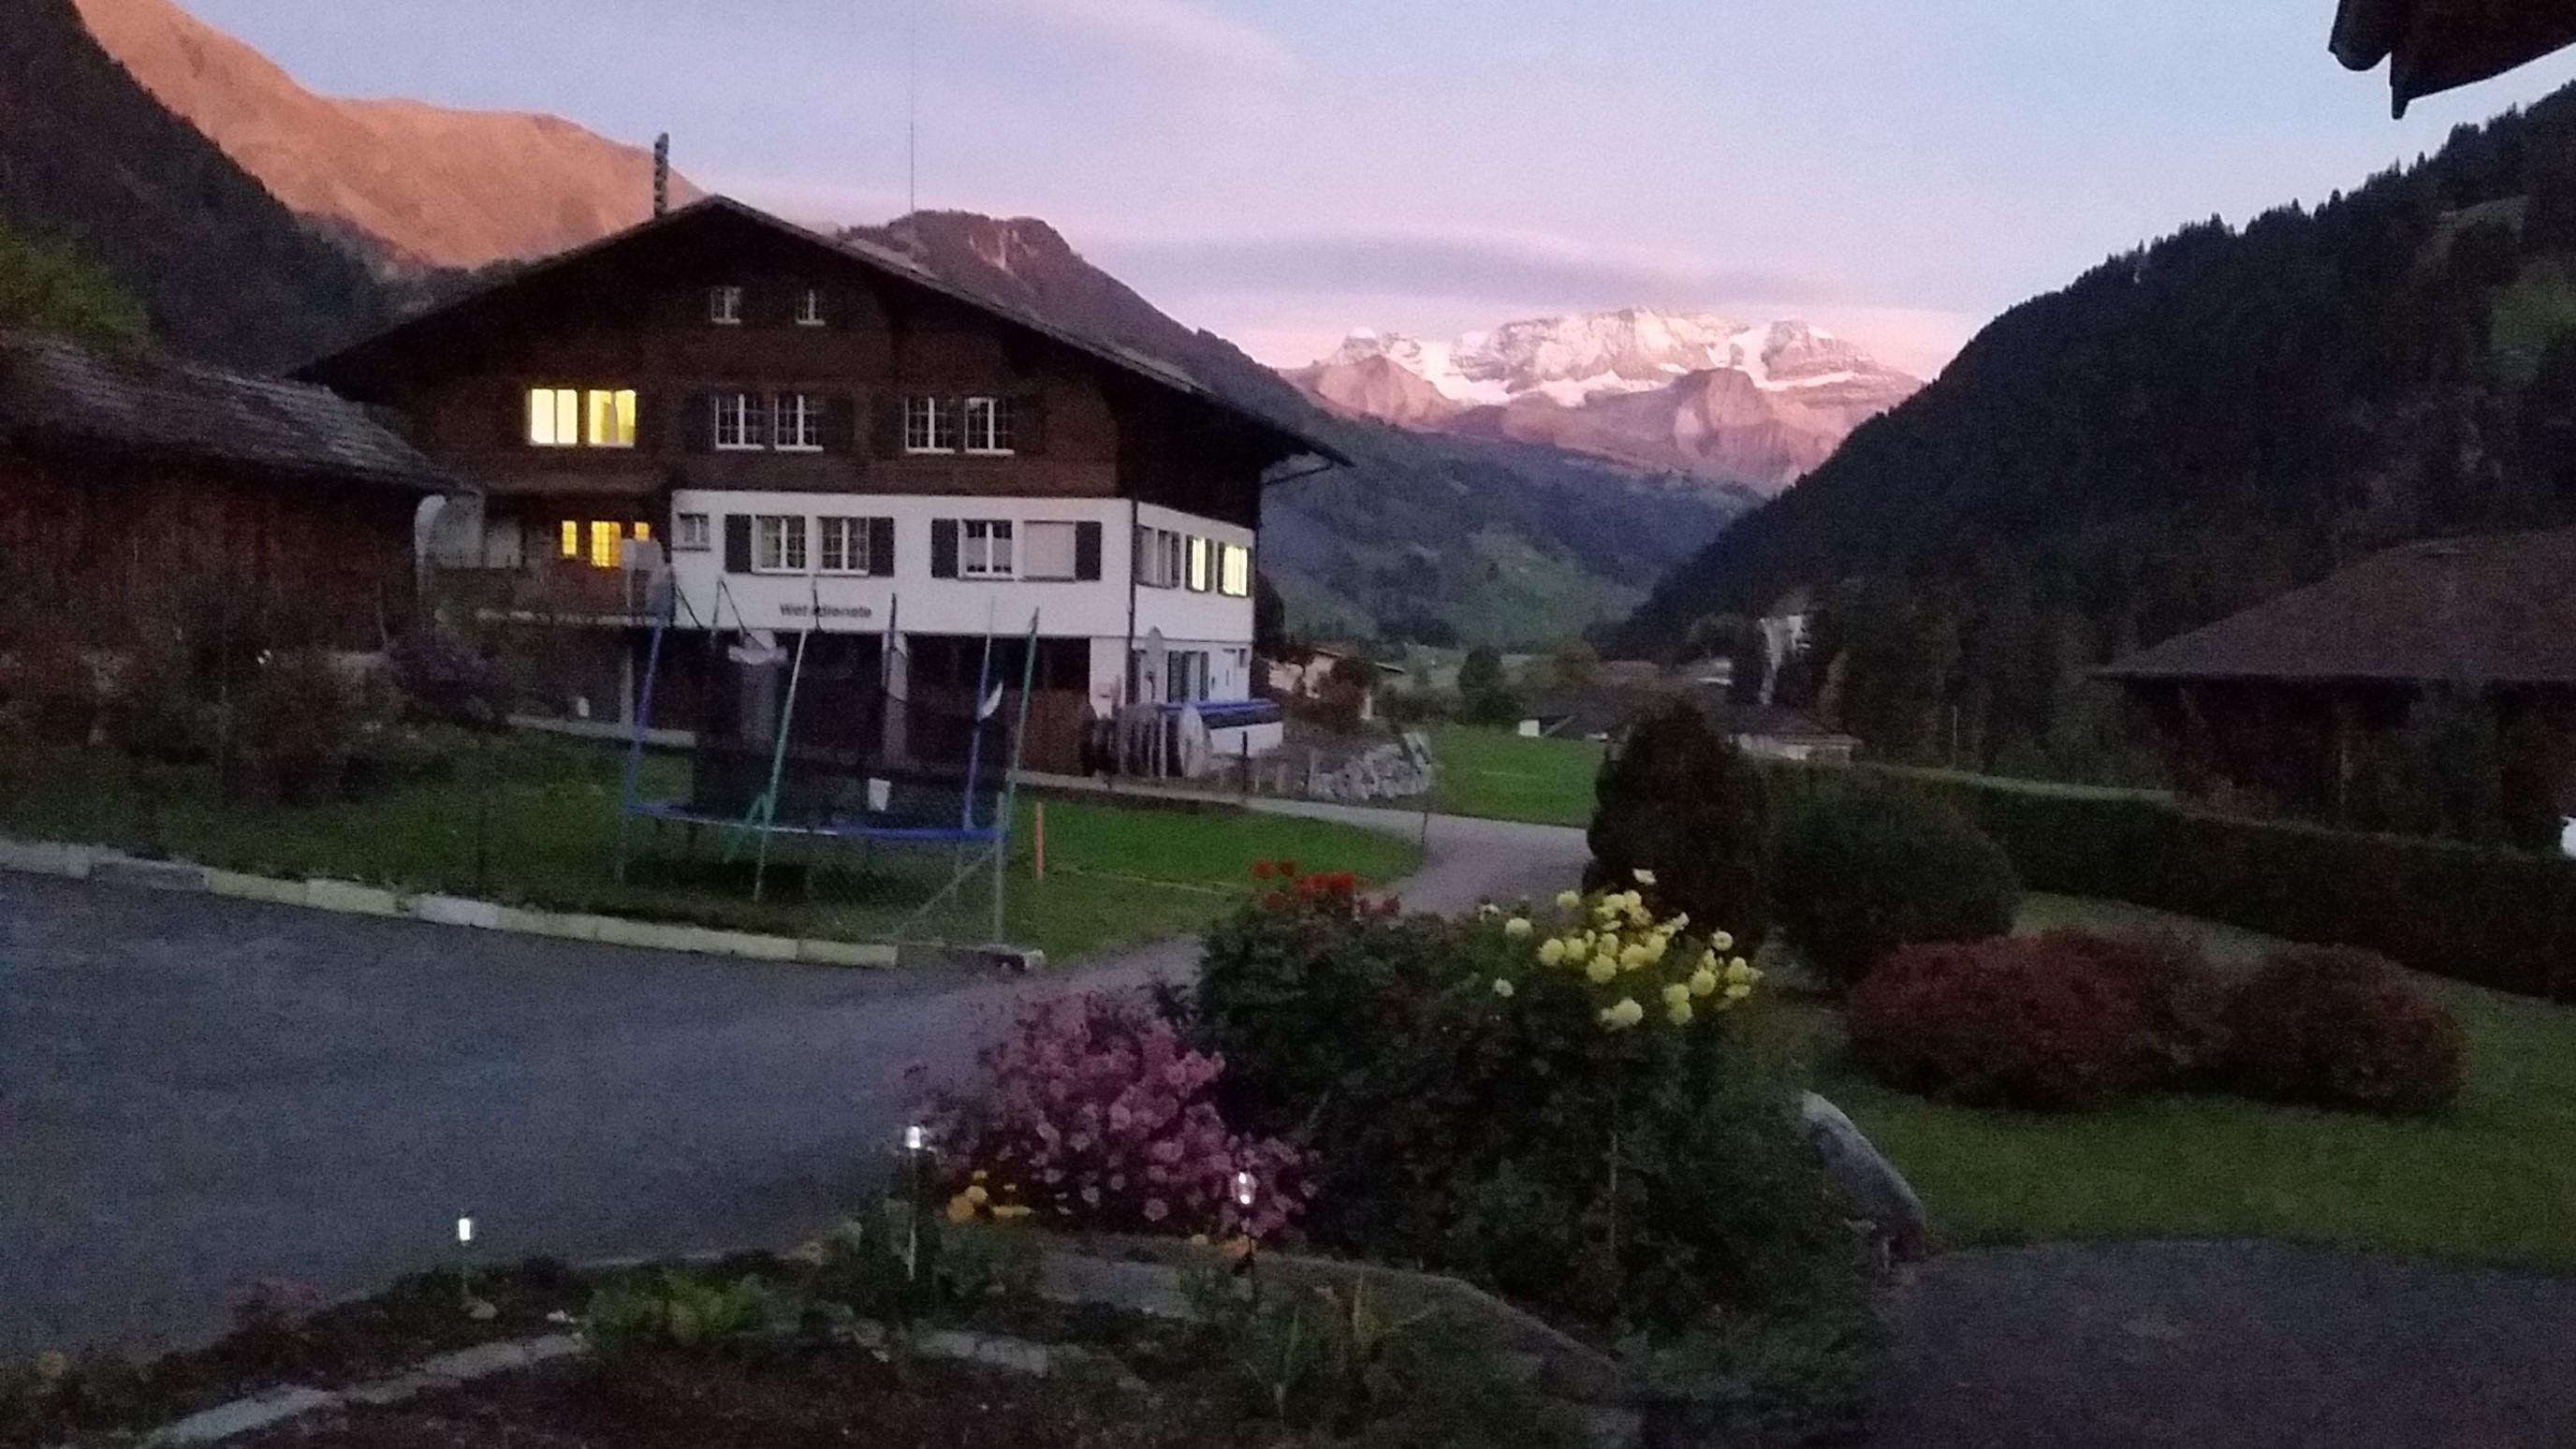 Chalet-Hotel Alpenblick Wildstrubel 9